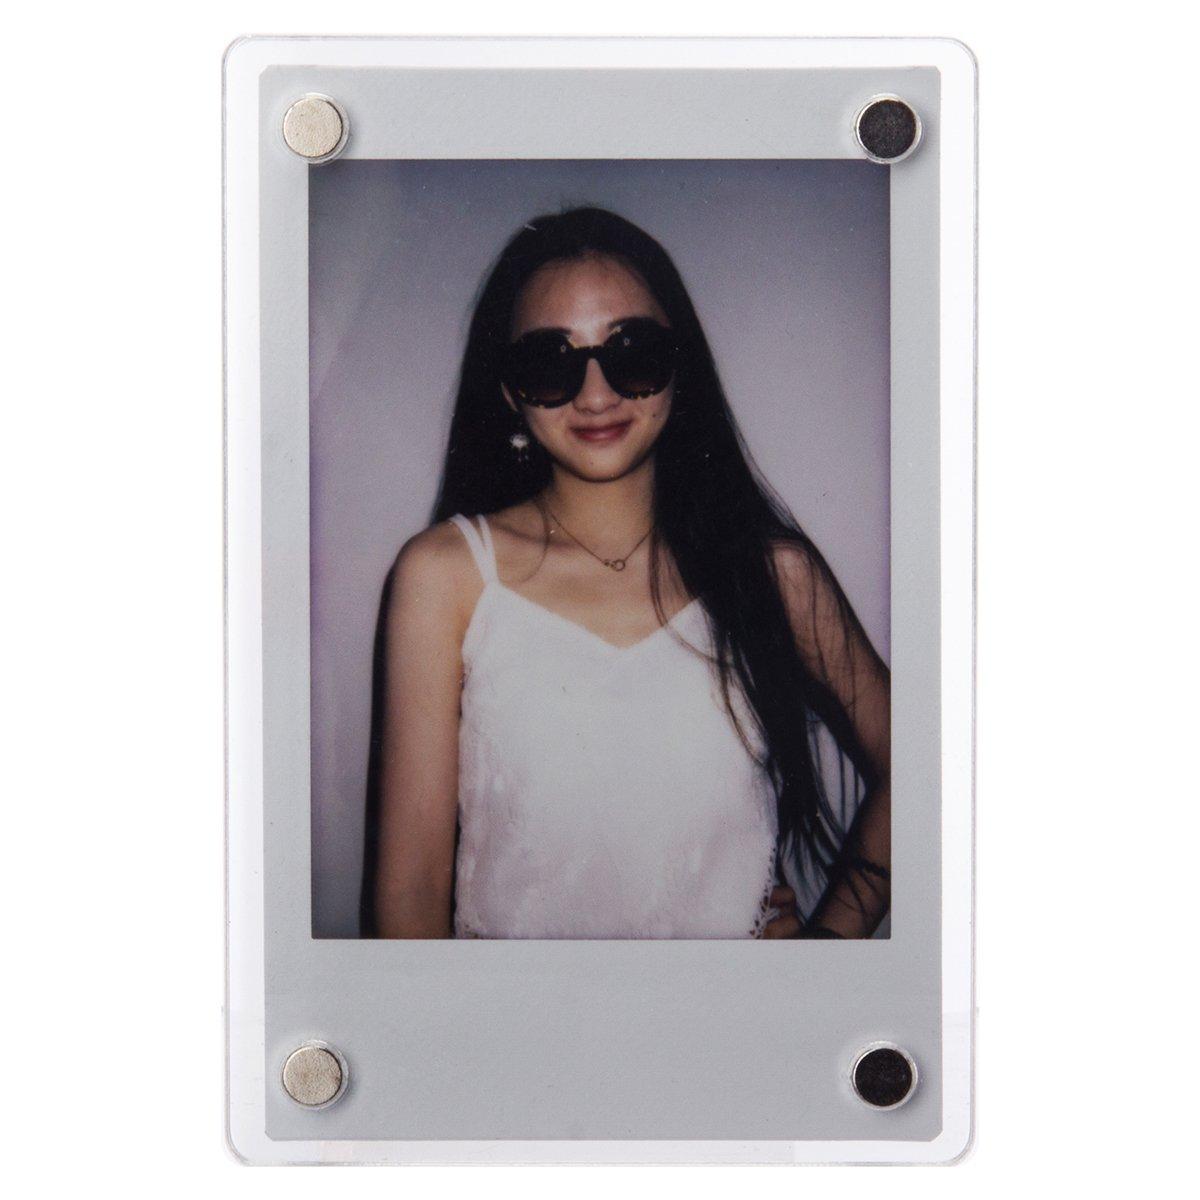 [Fujifilm Instax Photo Frame] Woodmin 3- inch Colorful Wall Decor Hanging Combination Frame for Instax mini / Pringo 231 /SP 1 / Polaroid PIC-300P / Polaroid Z2300 Films